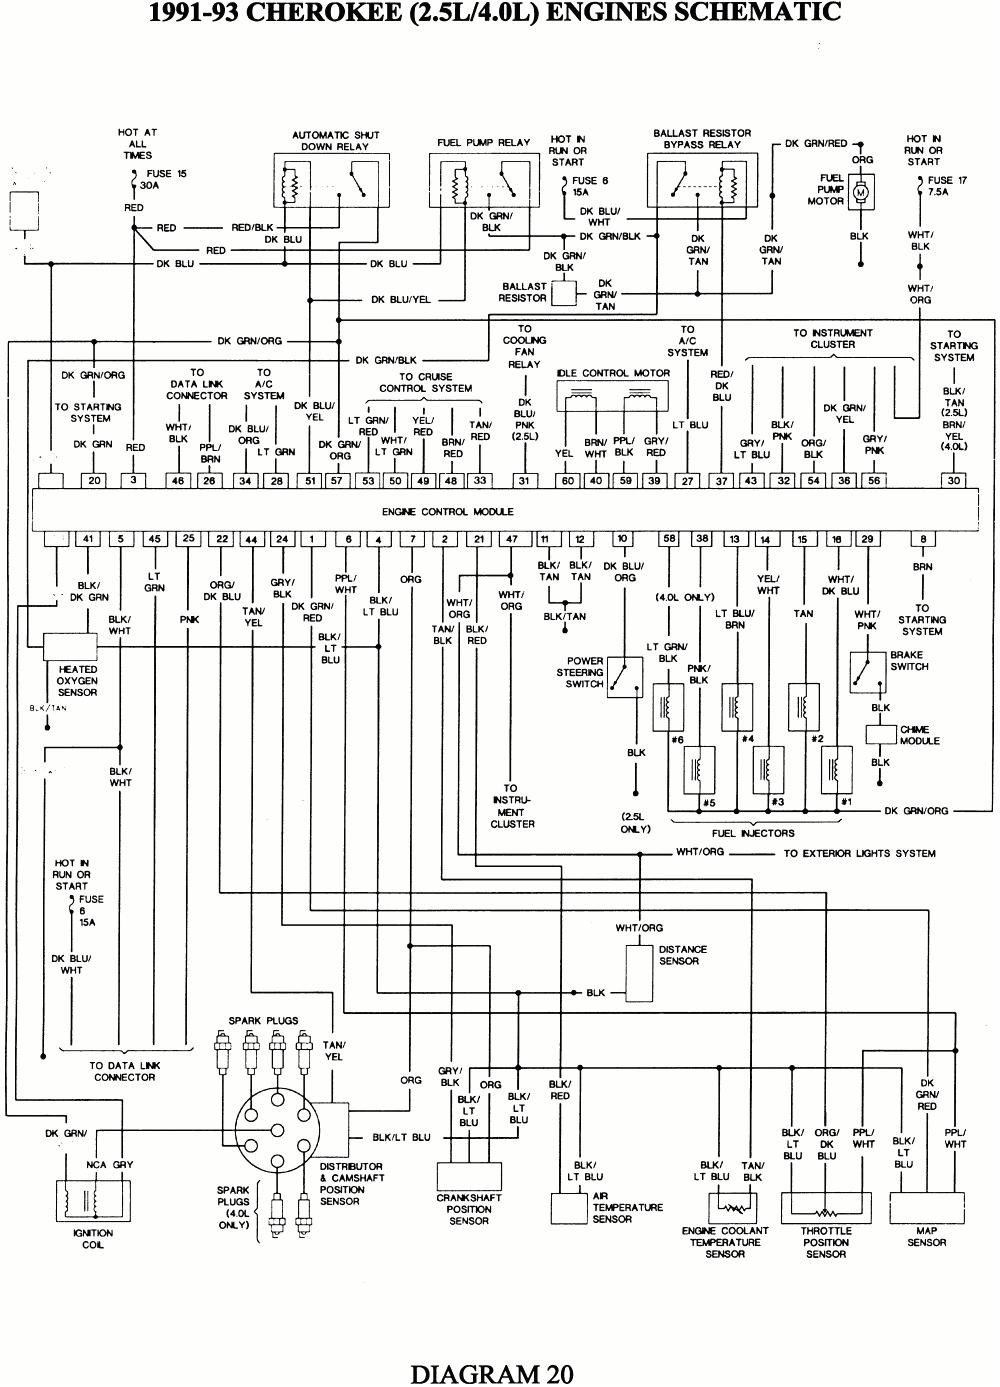 jeep xj auto trans wiring wiring diagram sheet 2000 jeep xj auto trans wiring wiring diagram